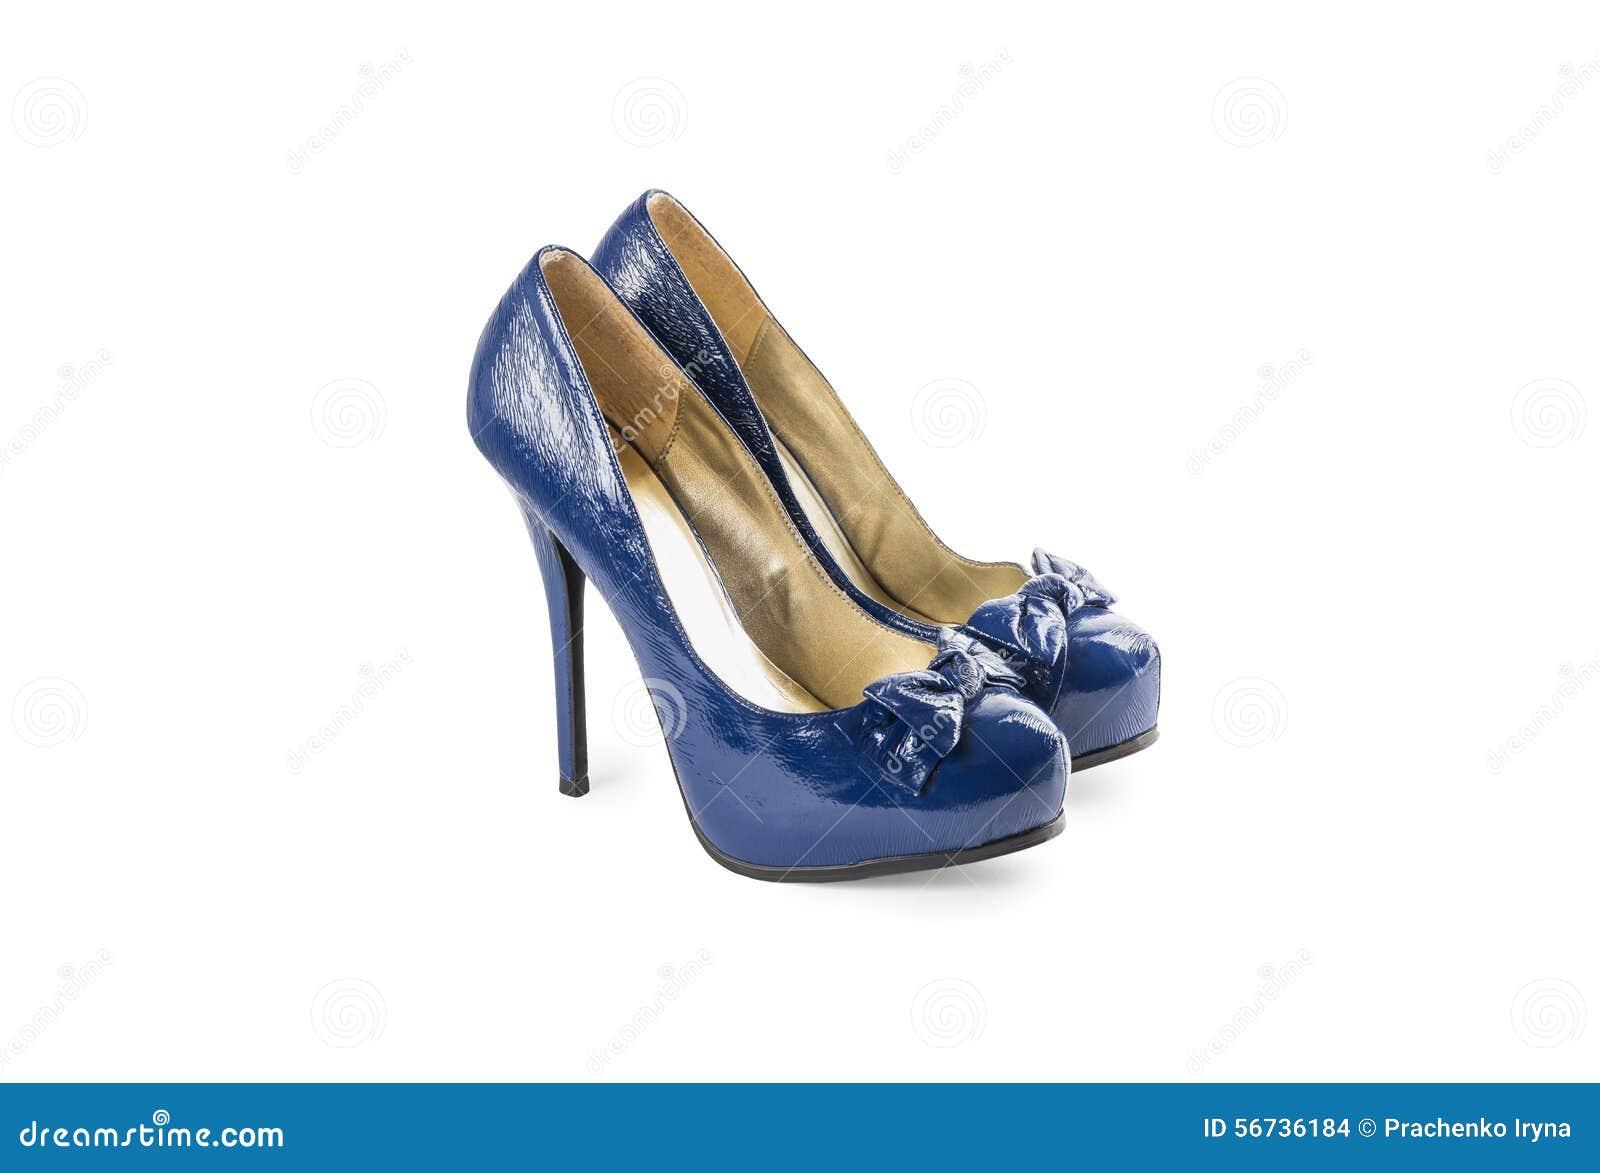 Blu Stock Fotografia Con Verniciate I Tacchi Alti Femminile Scarpe 5wRgq1n